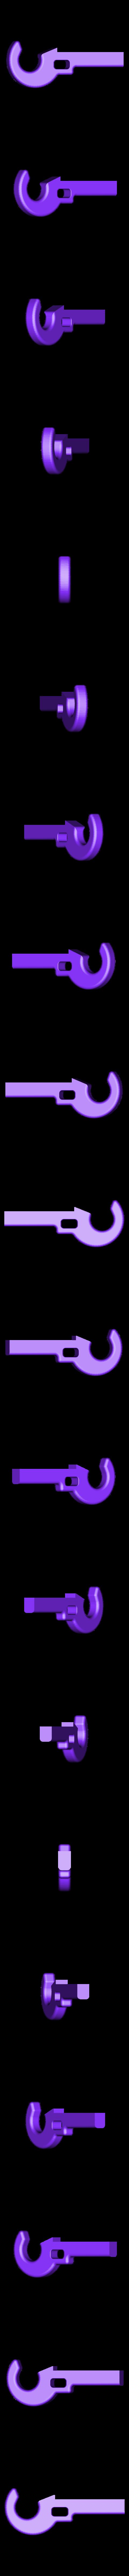 G crochet.STL Download STL file Draisine Matisa for LGB • 3D printable object, biddle